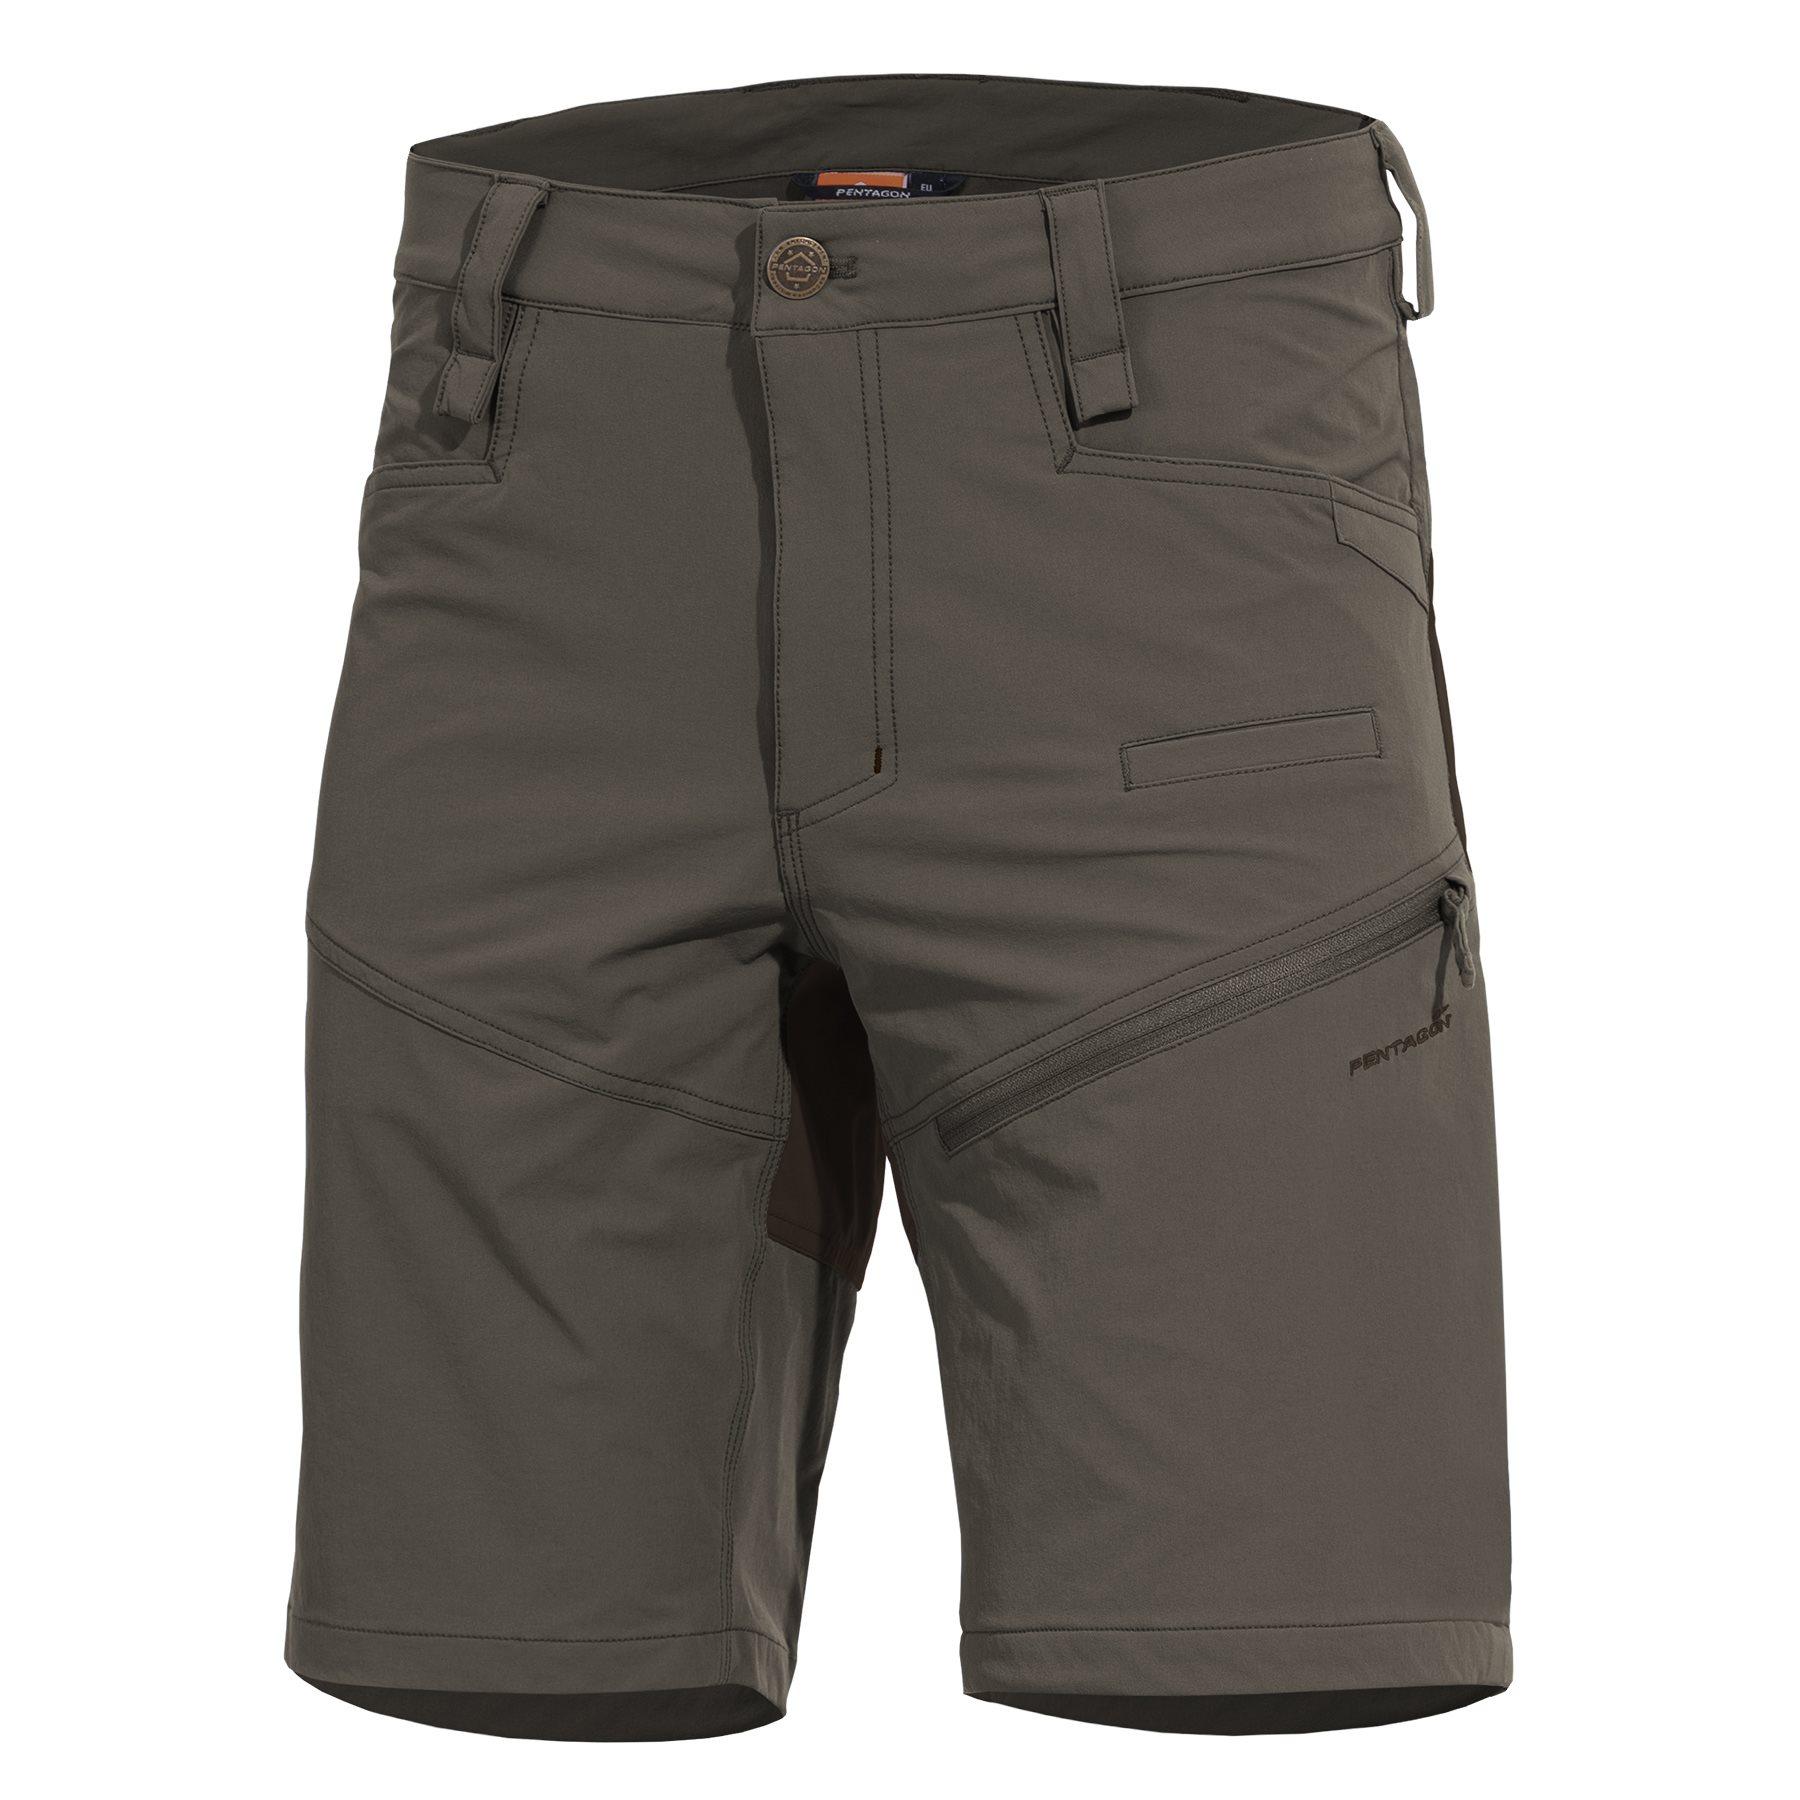 Shorts RENEGADE SAVANNA RAL 7013 PENTAGON K05049-06E L-11